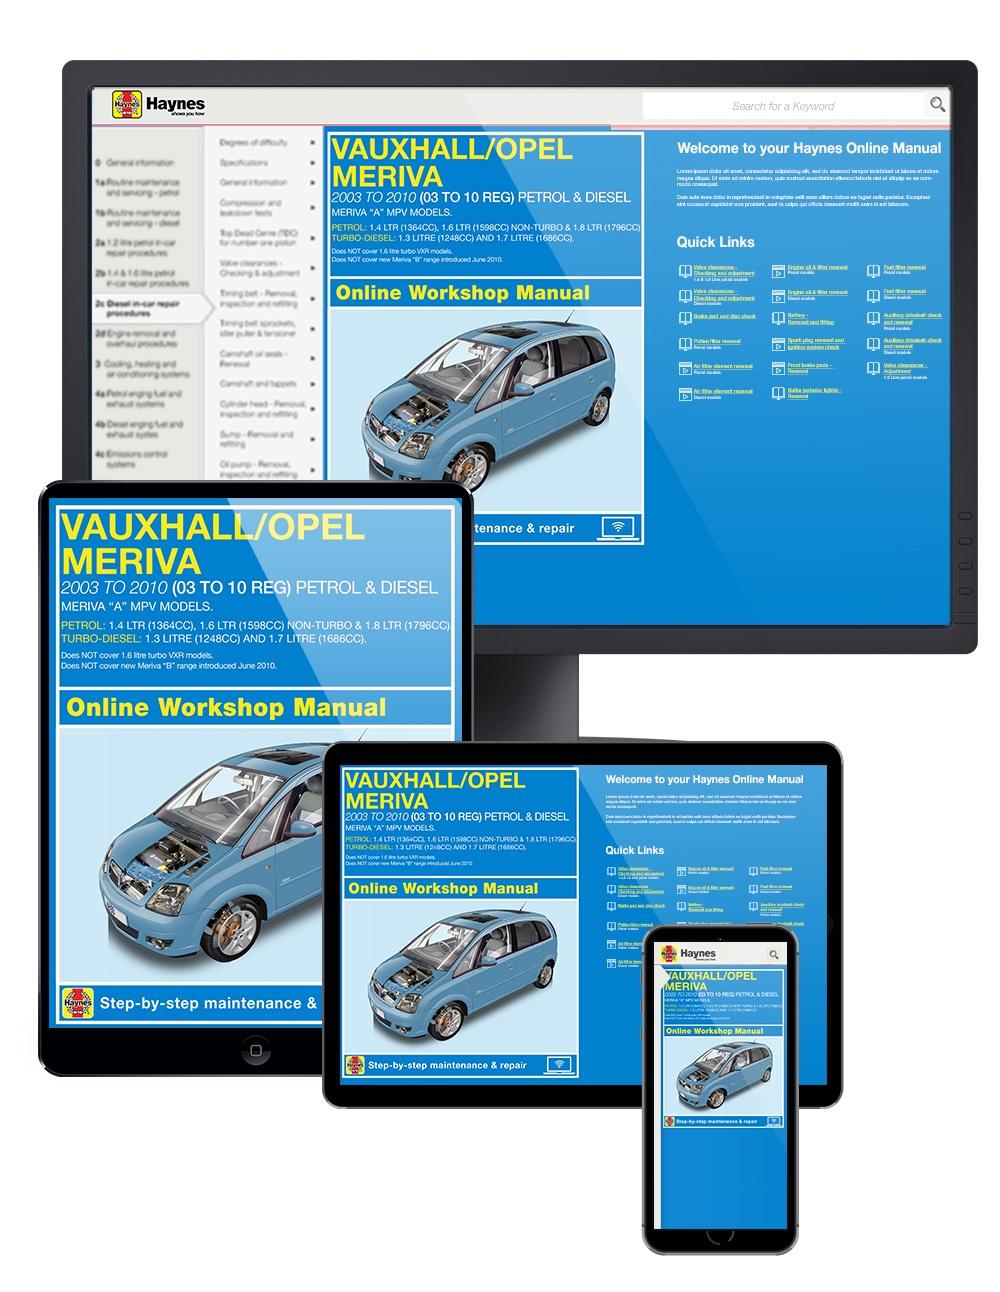 Manual cover for Vauxhall/Opel Meriva Petrol & Diesel (2003-May 2010) 03 to 10 Haynes Online Manual